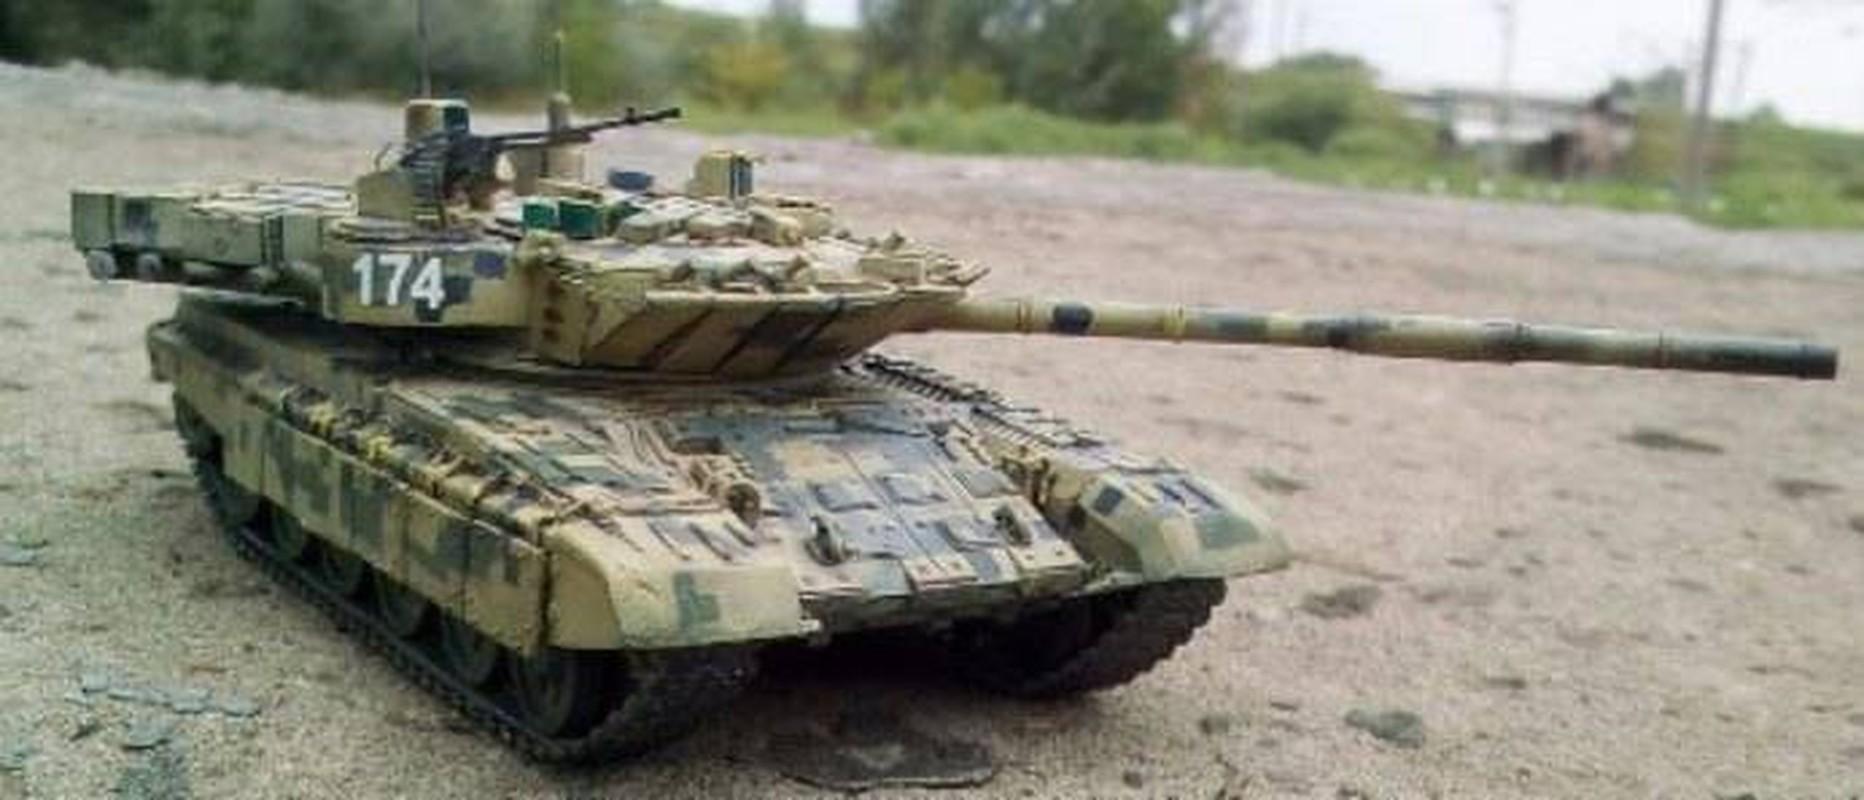 Bat ngo xuat hien phien ban xe tang T-80 manh ngang voi T-14 Armata-Hinh-8